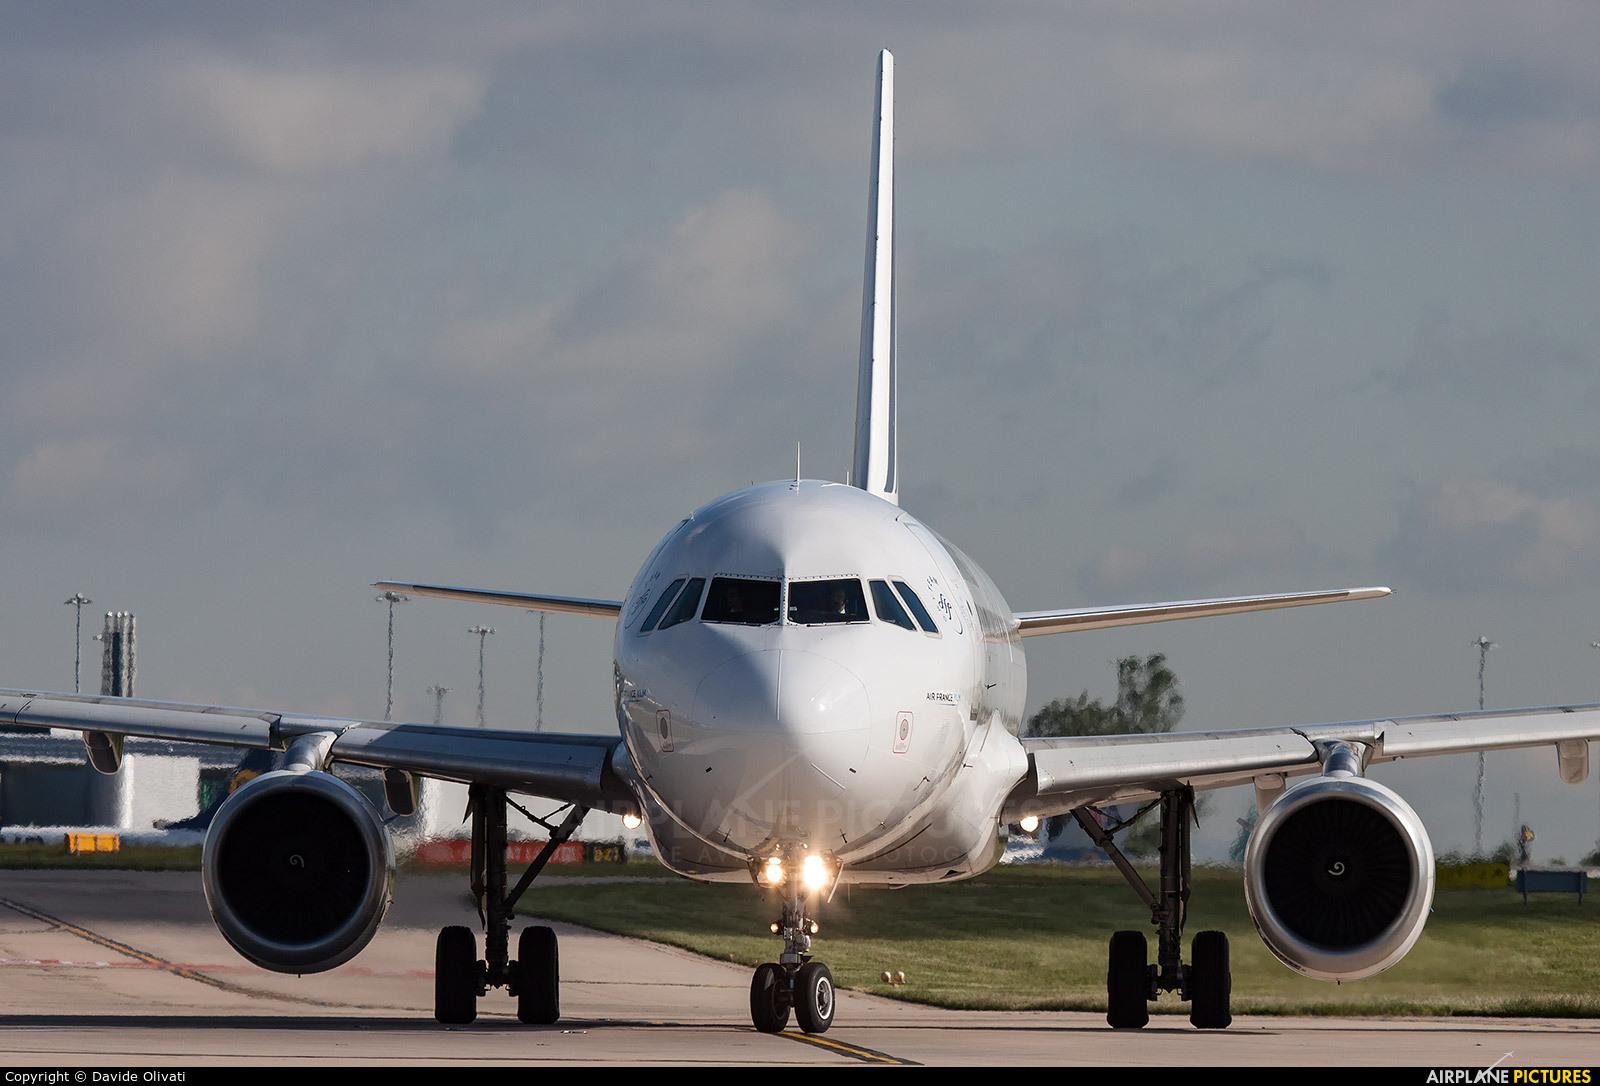 Air France F-GJVW aircraft at Manchester